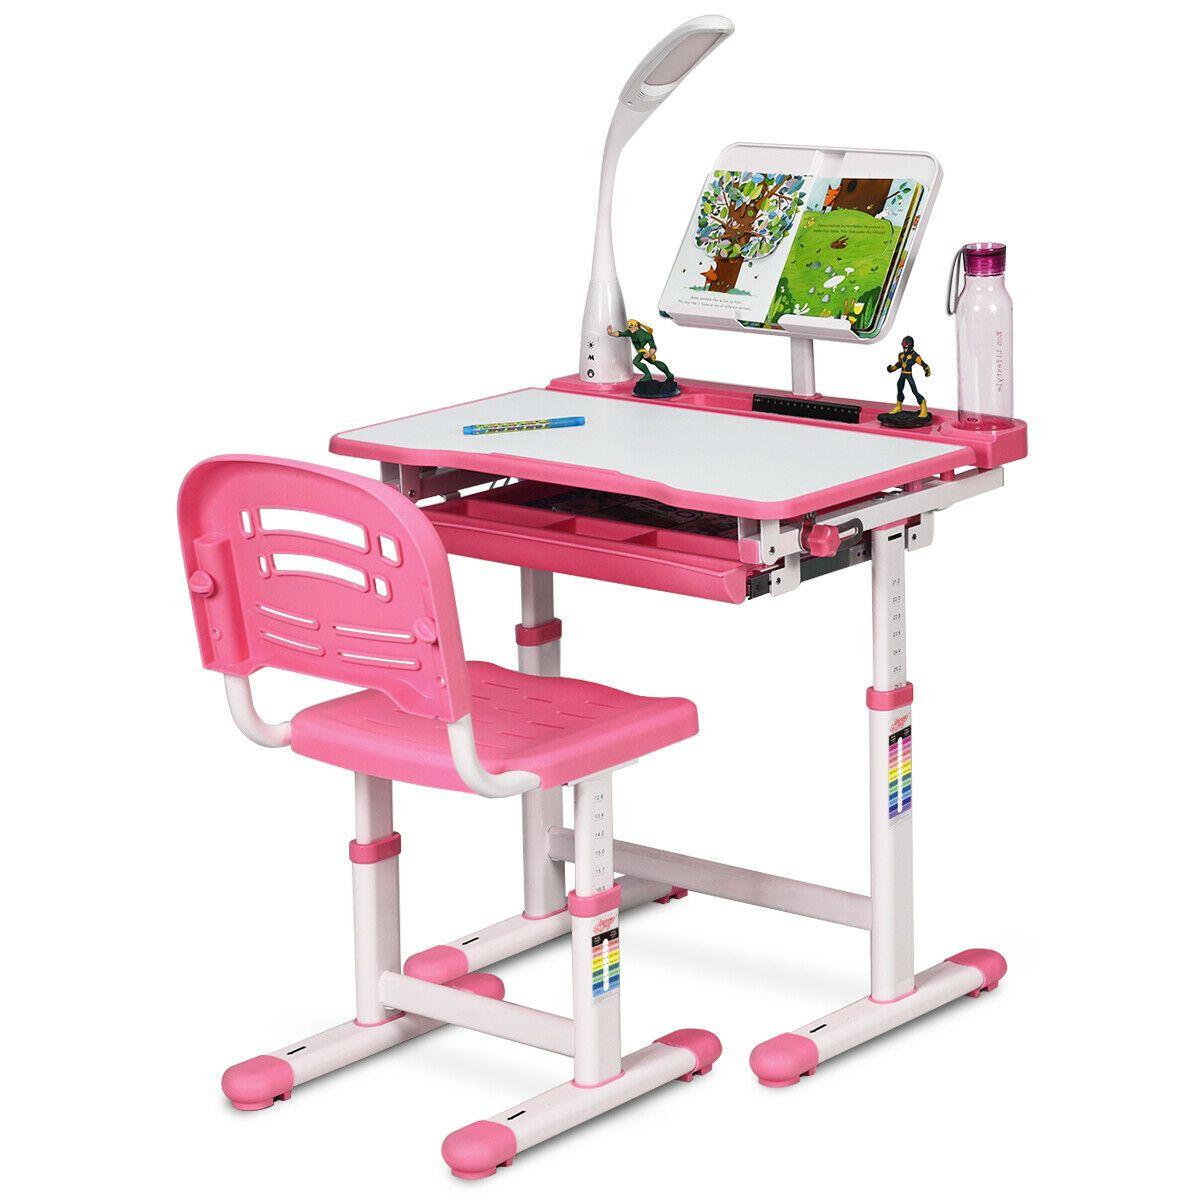 Gymax Height Adjustable Kids Desk Chair Set Study Drawing W Lamp Bookstand Pink Walmart Com Kids Desk Chair Desk And Chair Set Adjustable Height Desk Chair Child desk and chair set